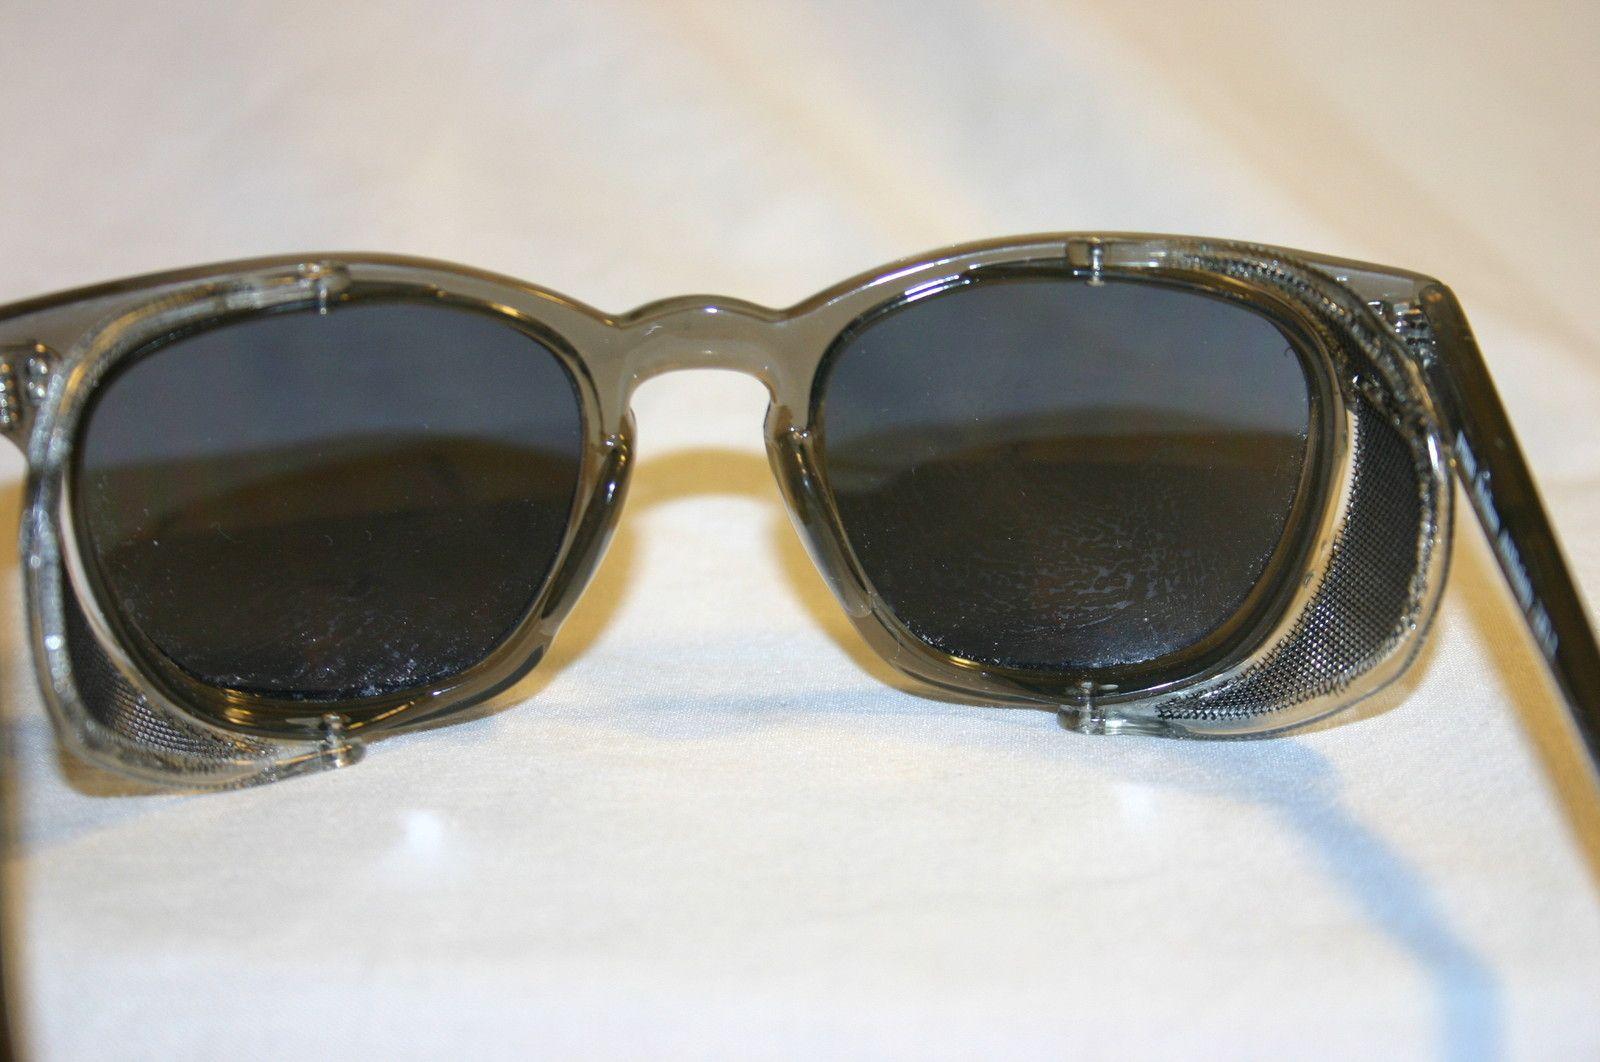 new ao american optical steam safety frames shield eyeglasses sunglasses 48 ebay - Ebay Glasses Frames